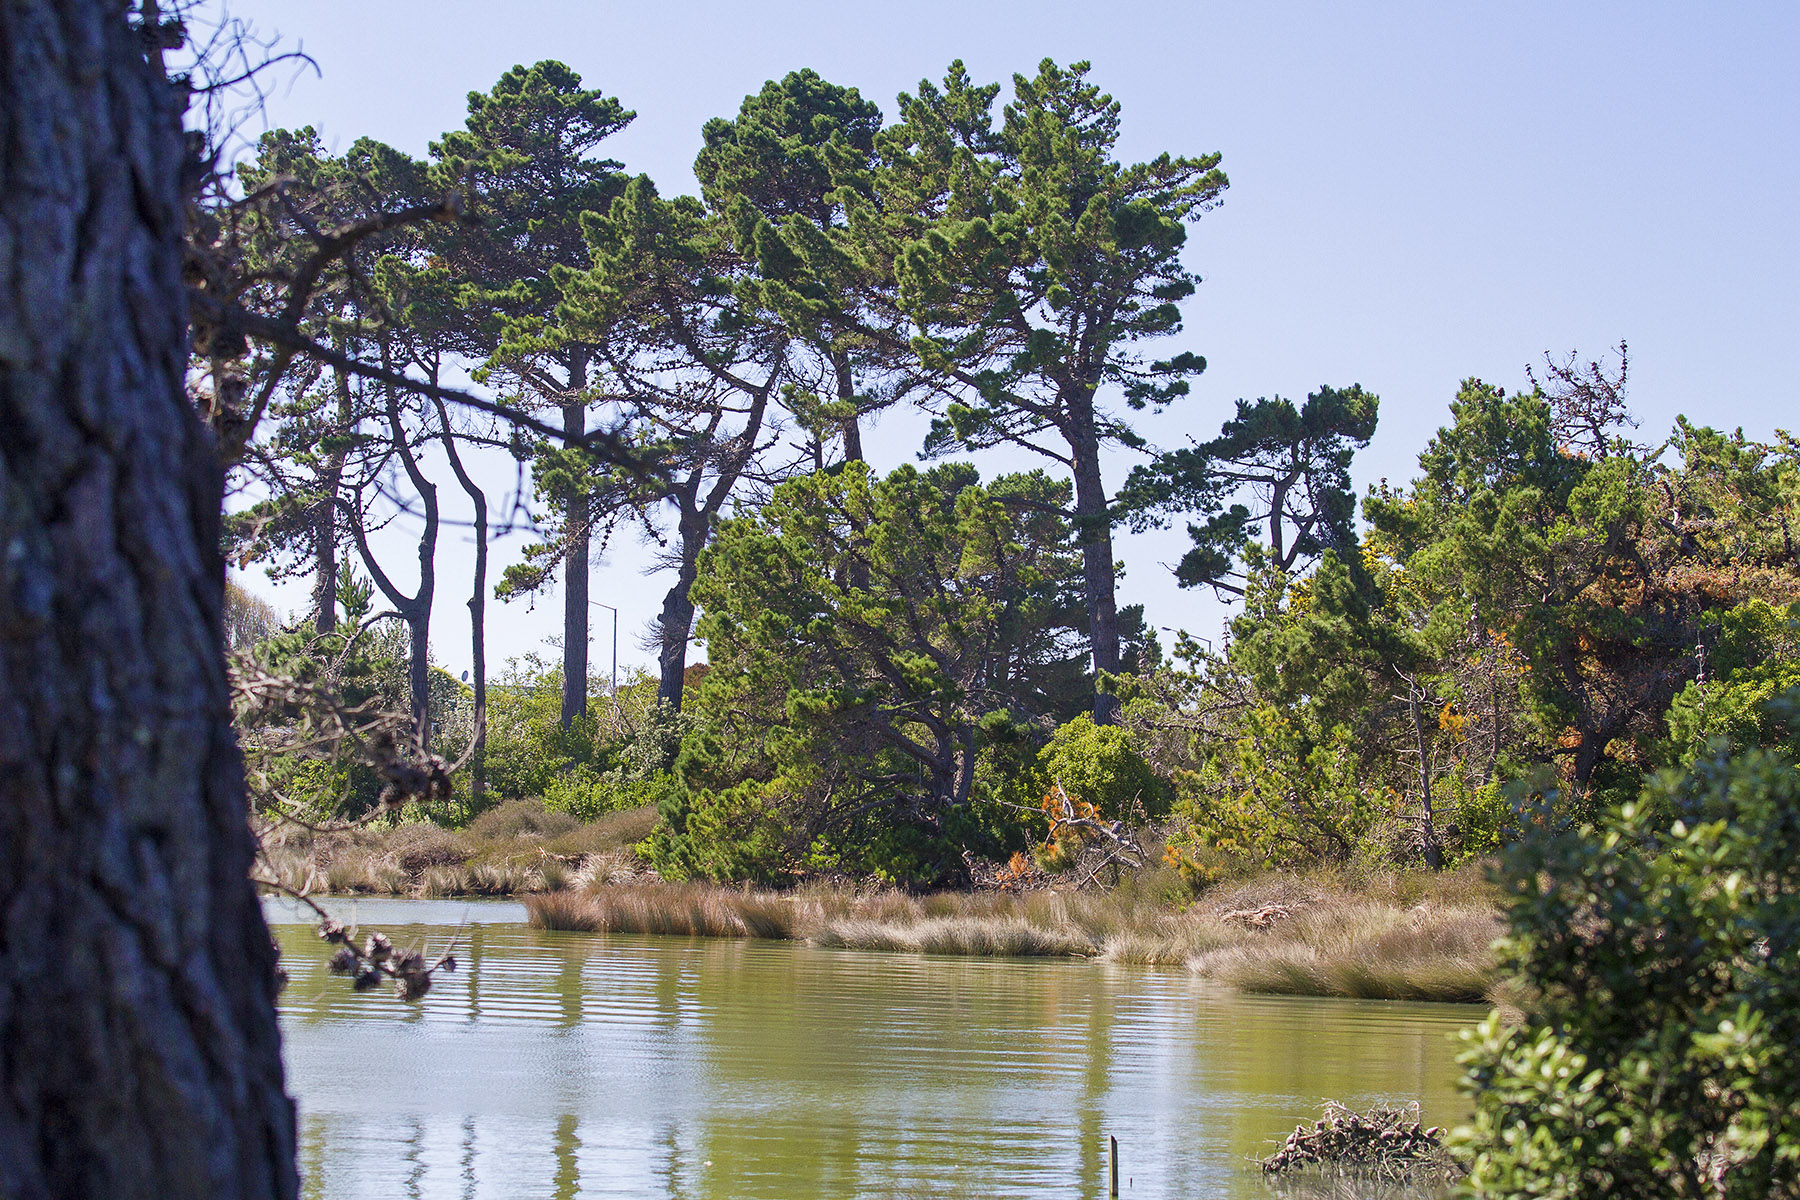 Snb wetland